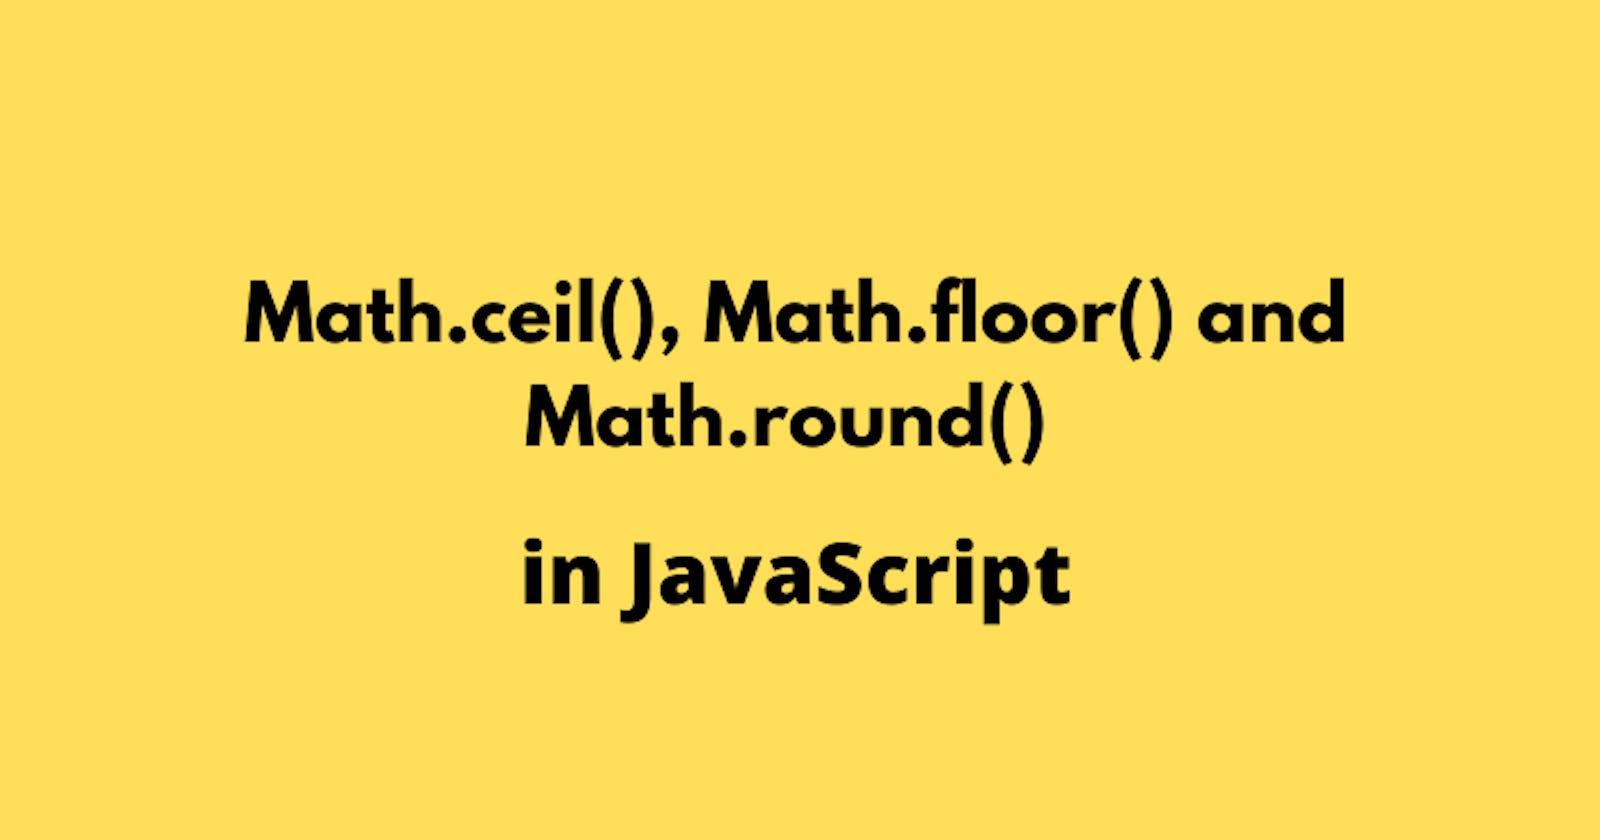 Let's talk about Math.ceil, Math.floor, and Math.round 🌿